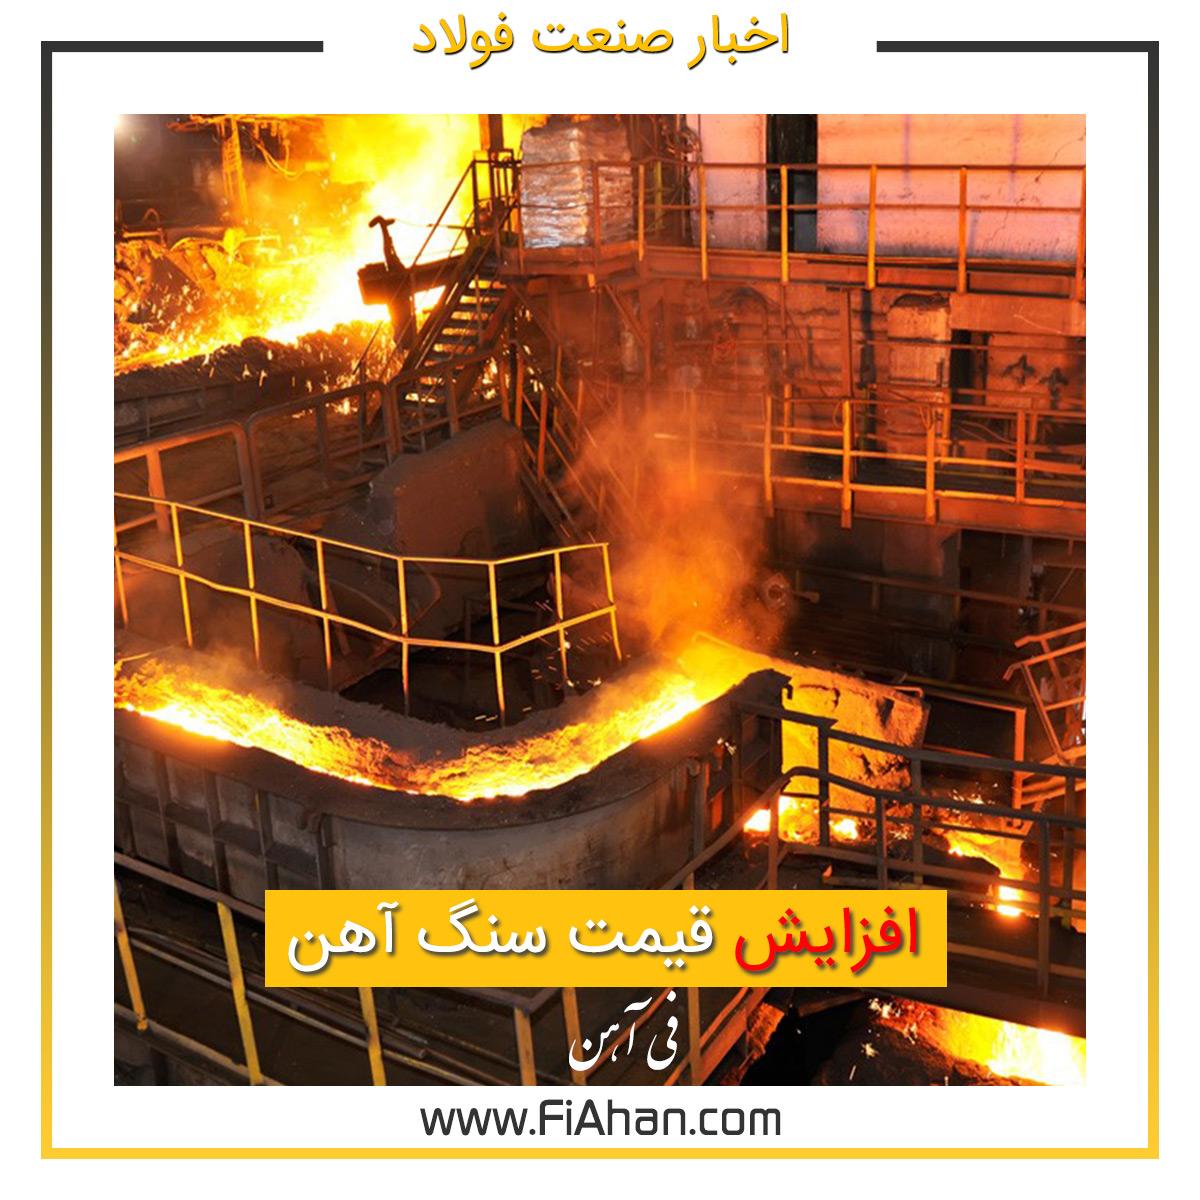 افزایش قیمت سنگ آهن